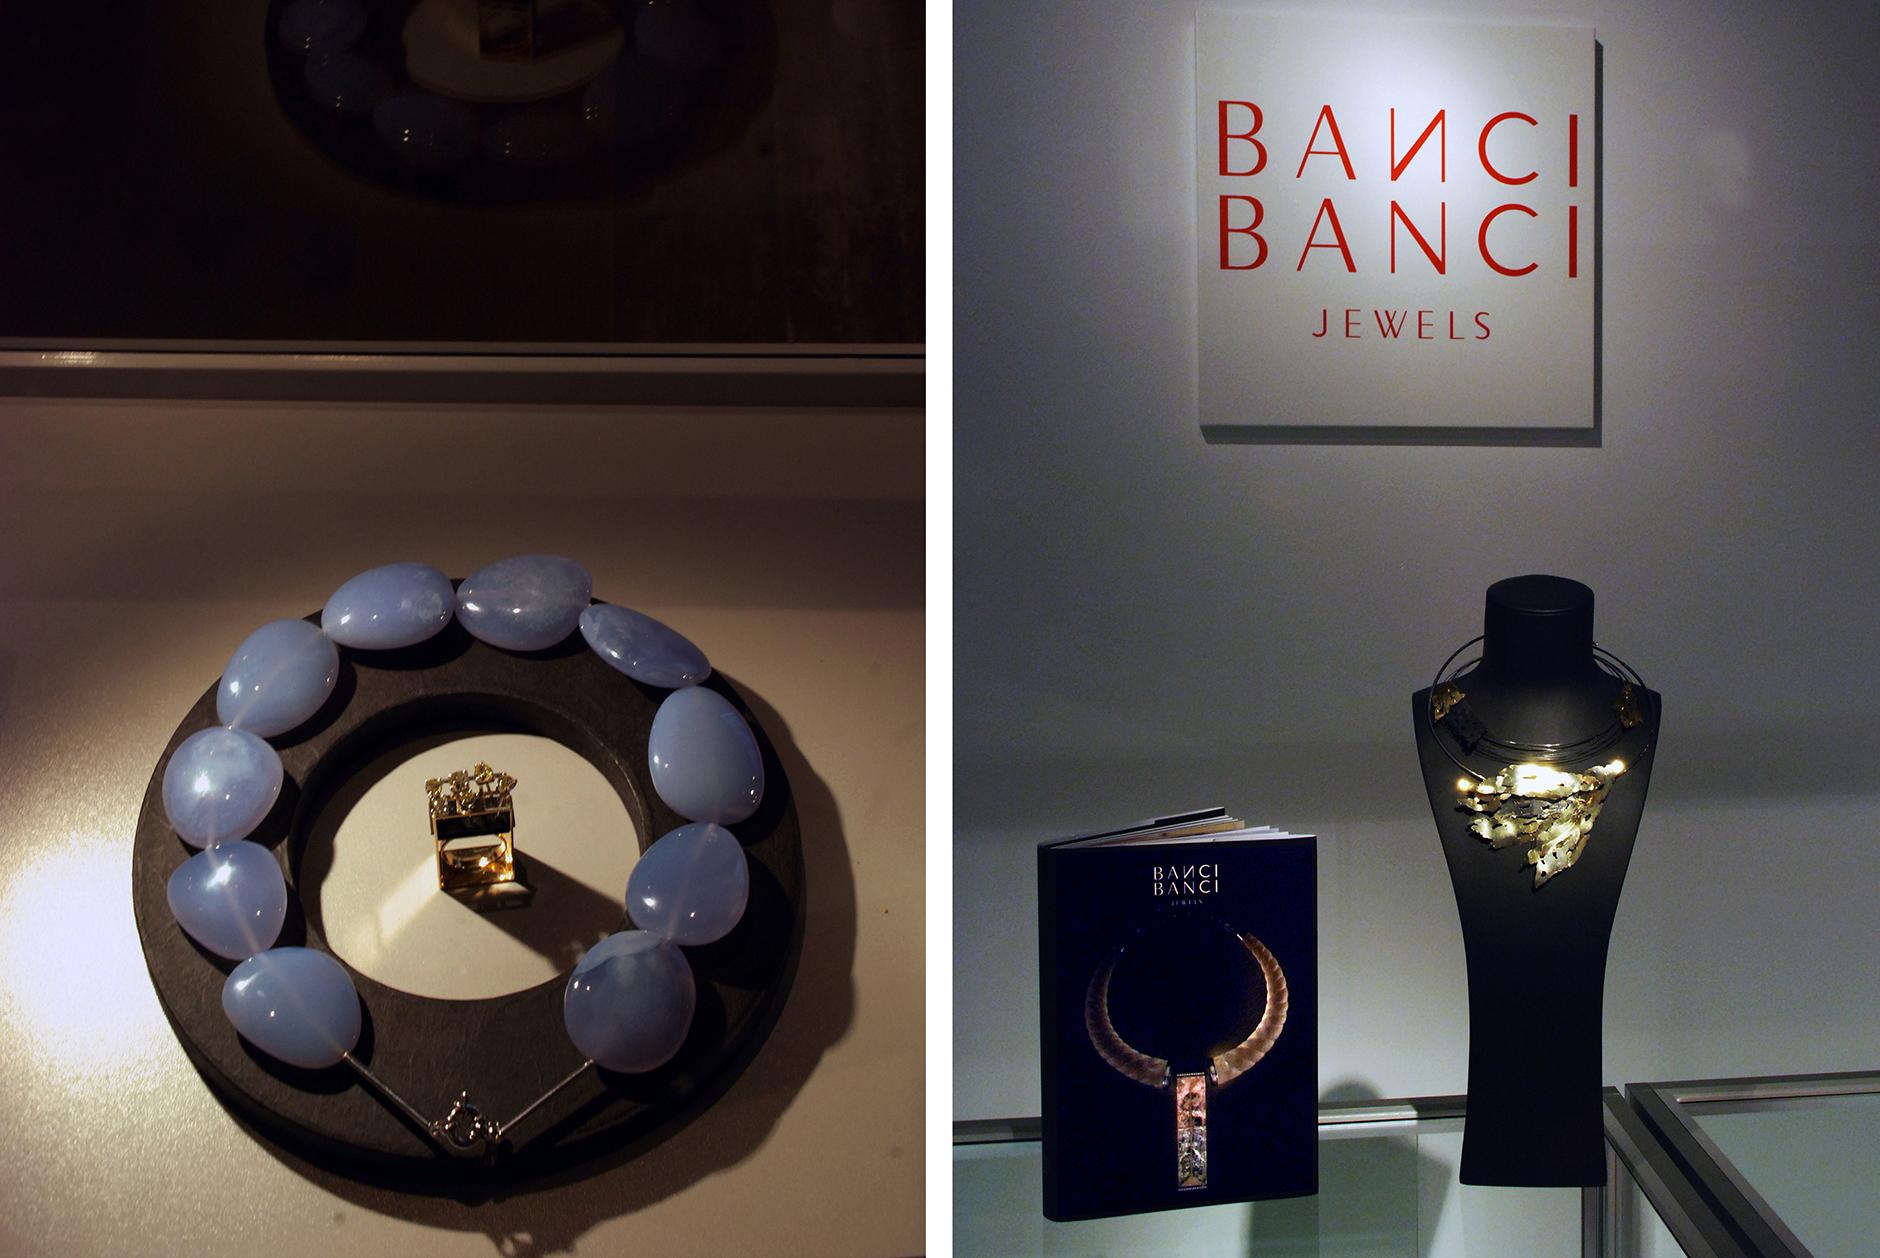 Banci-Banci-2014_08_08-Art-Nocturne-39-8-9-1880x12601